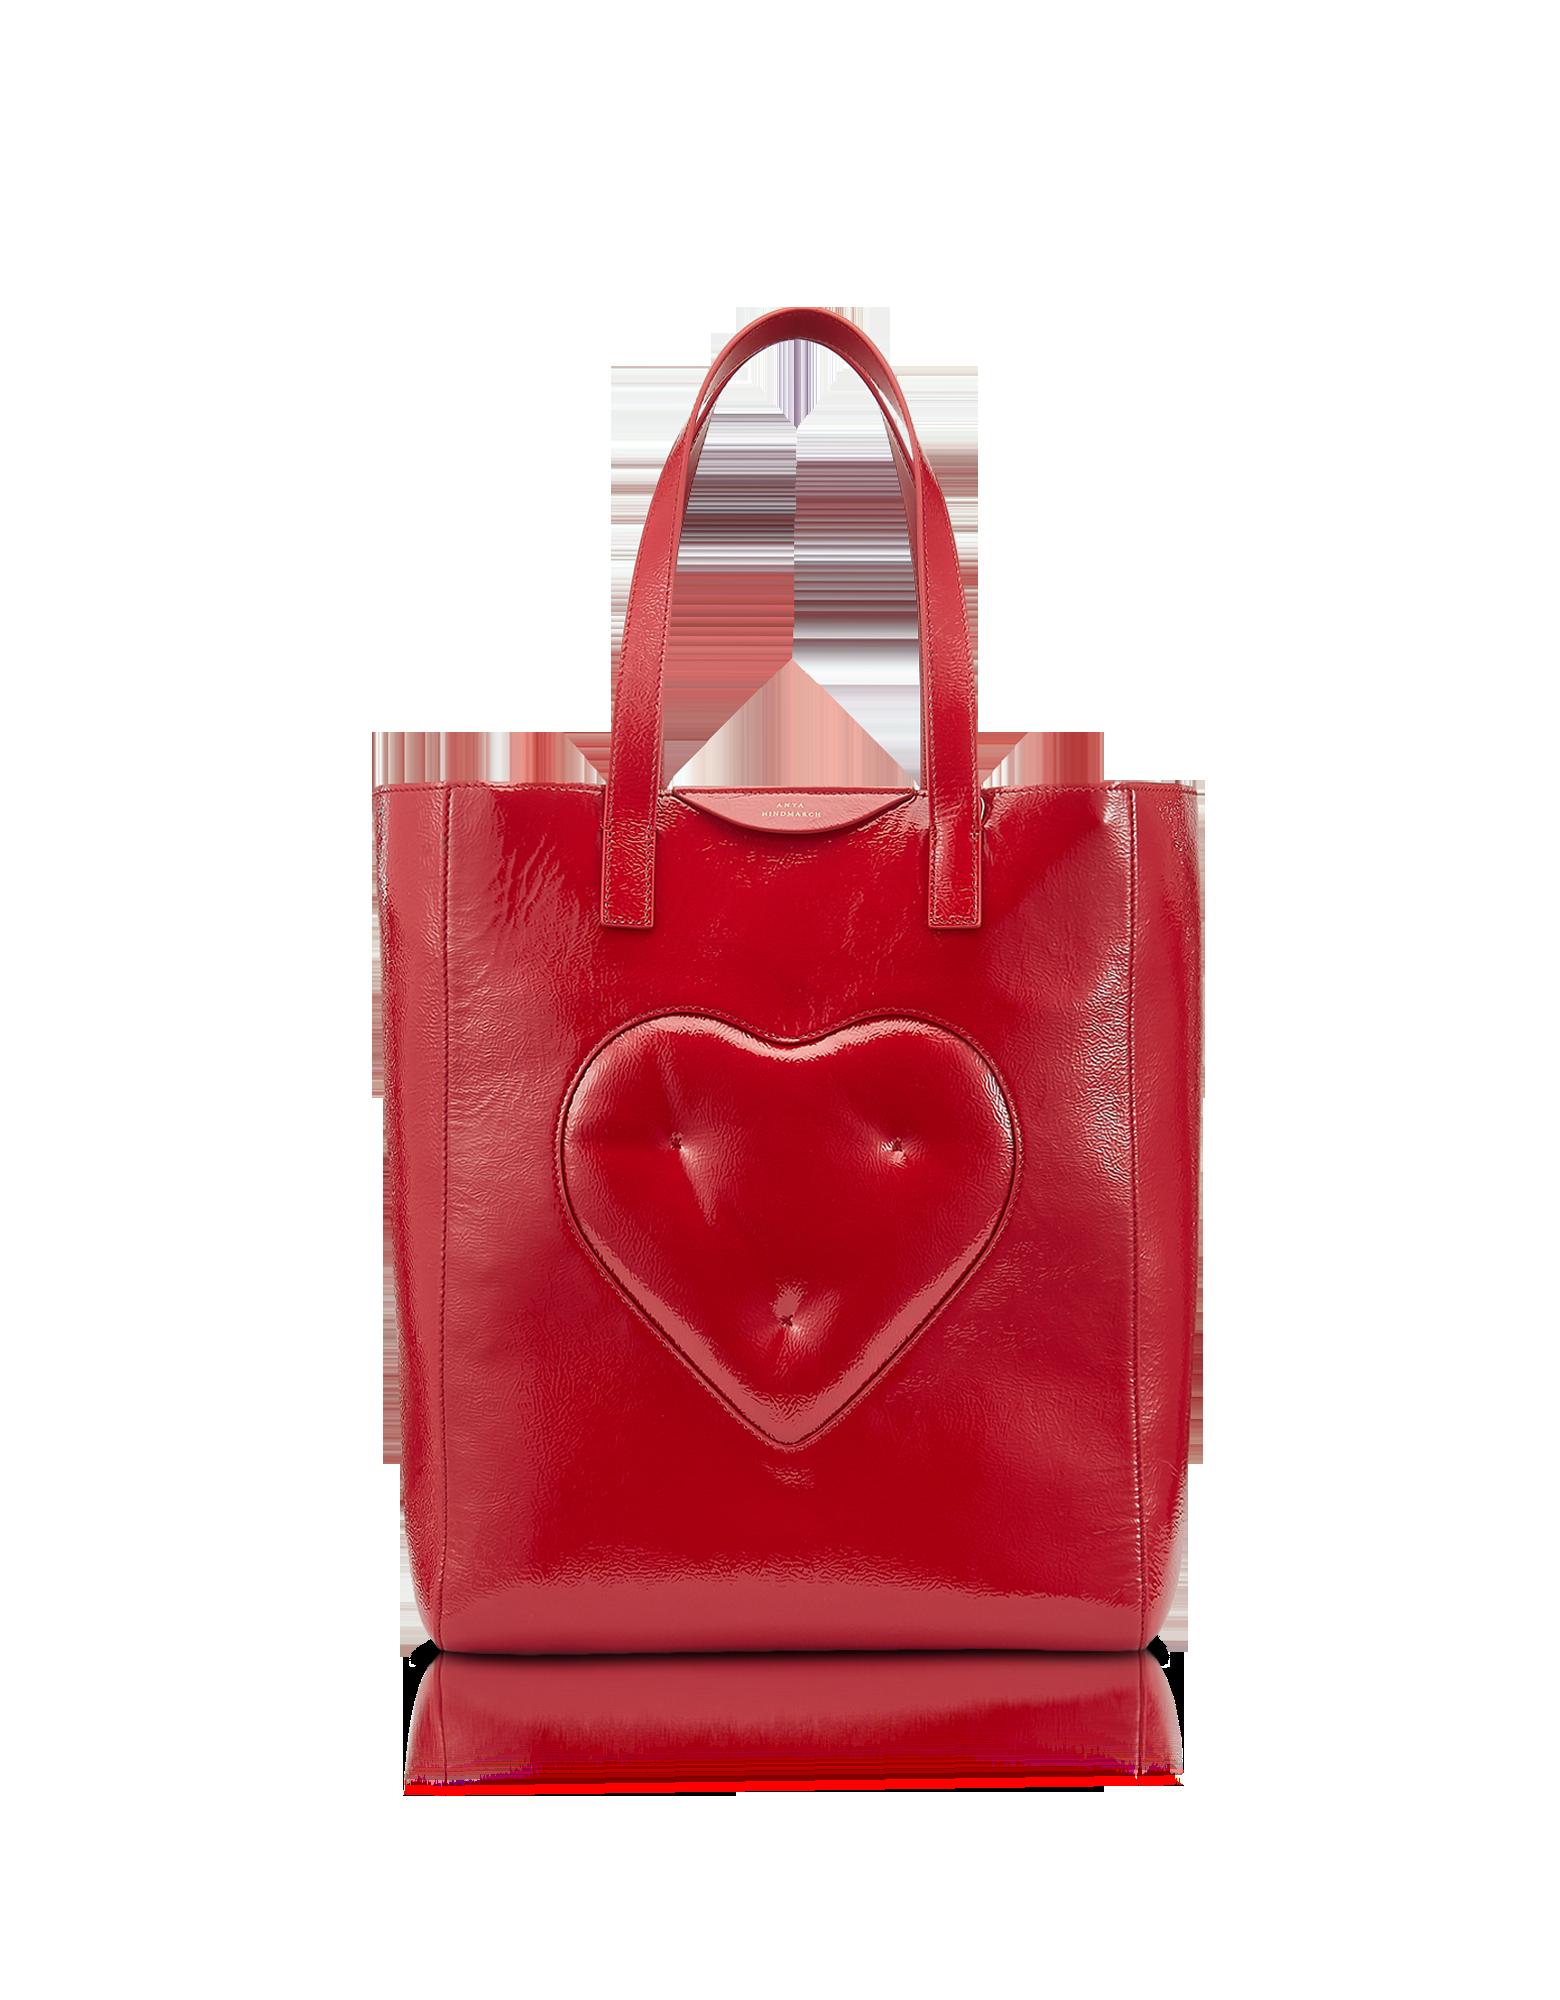 Image of Dark Red Naplak Chubby Heart Tote Bag